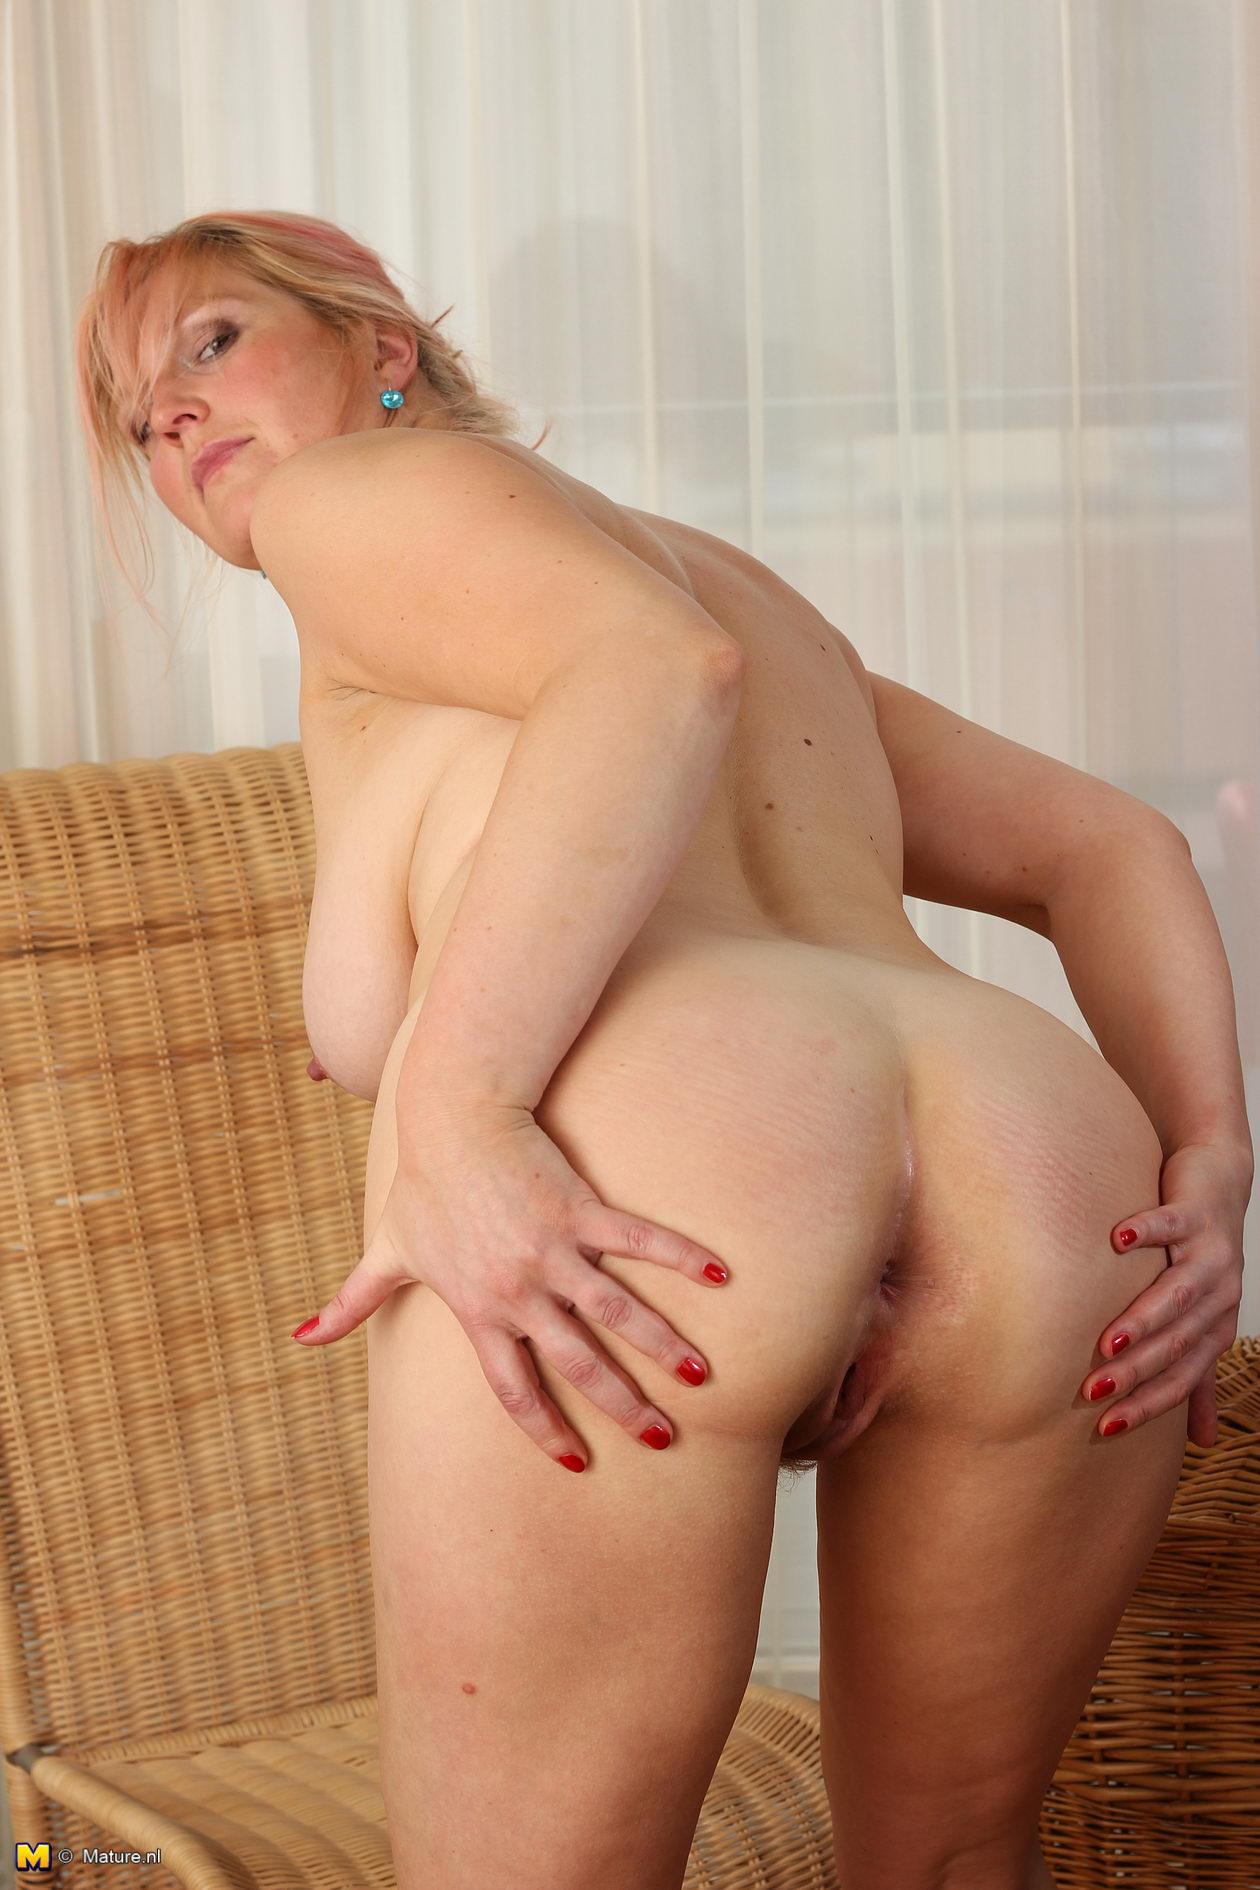 Asia Big Tits Uncensored